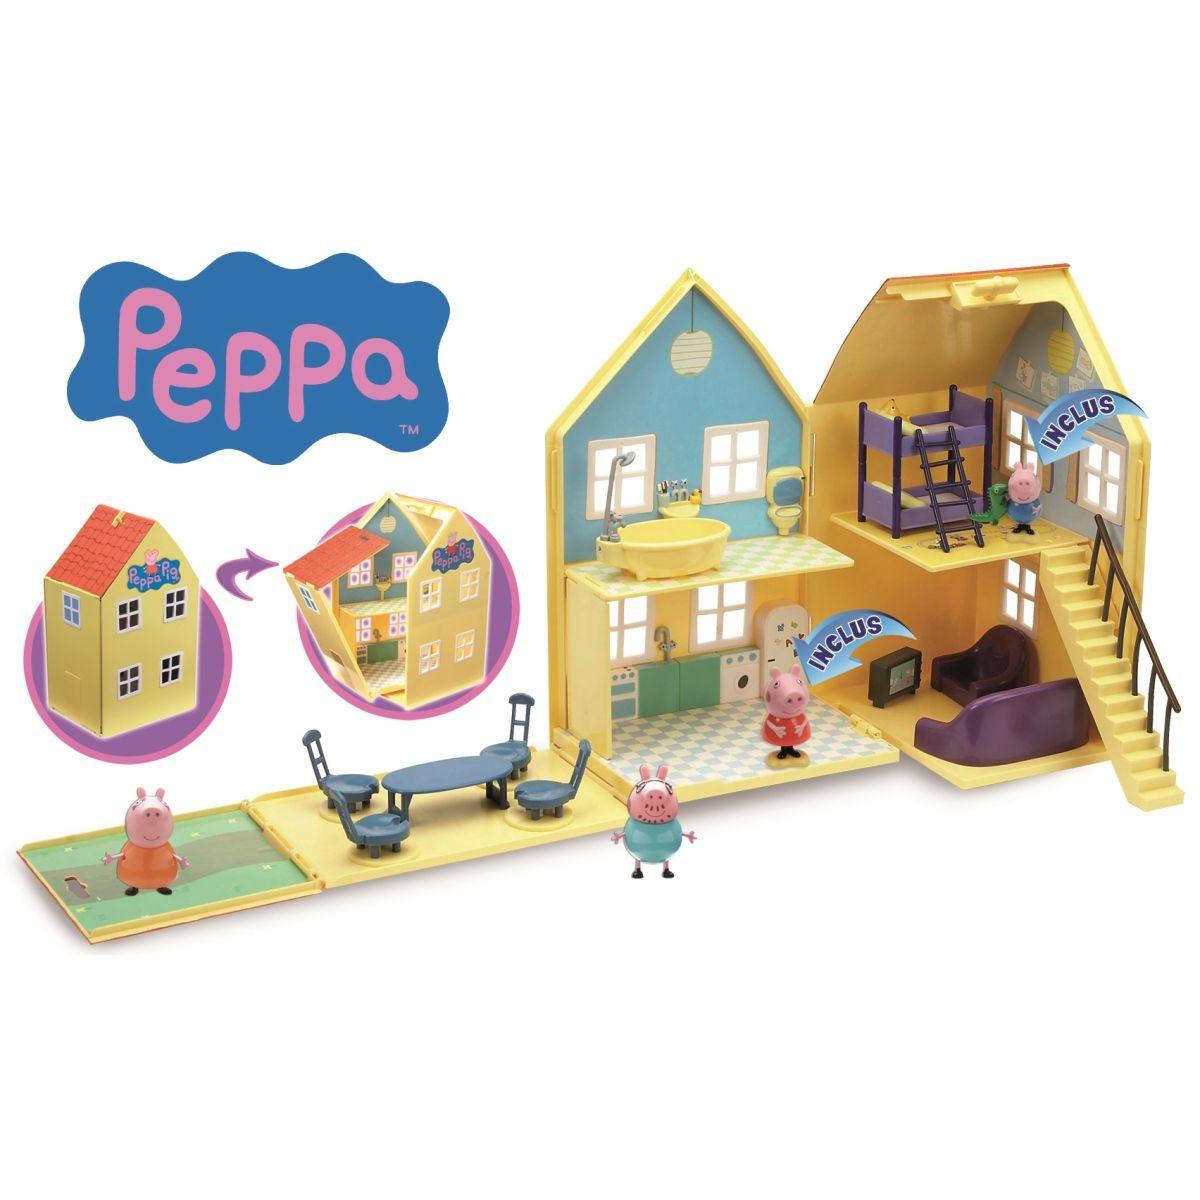 maison peppa pig